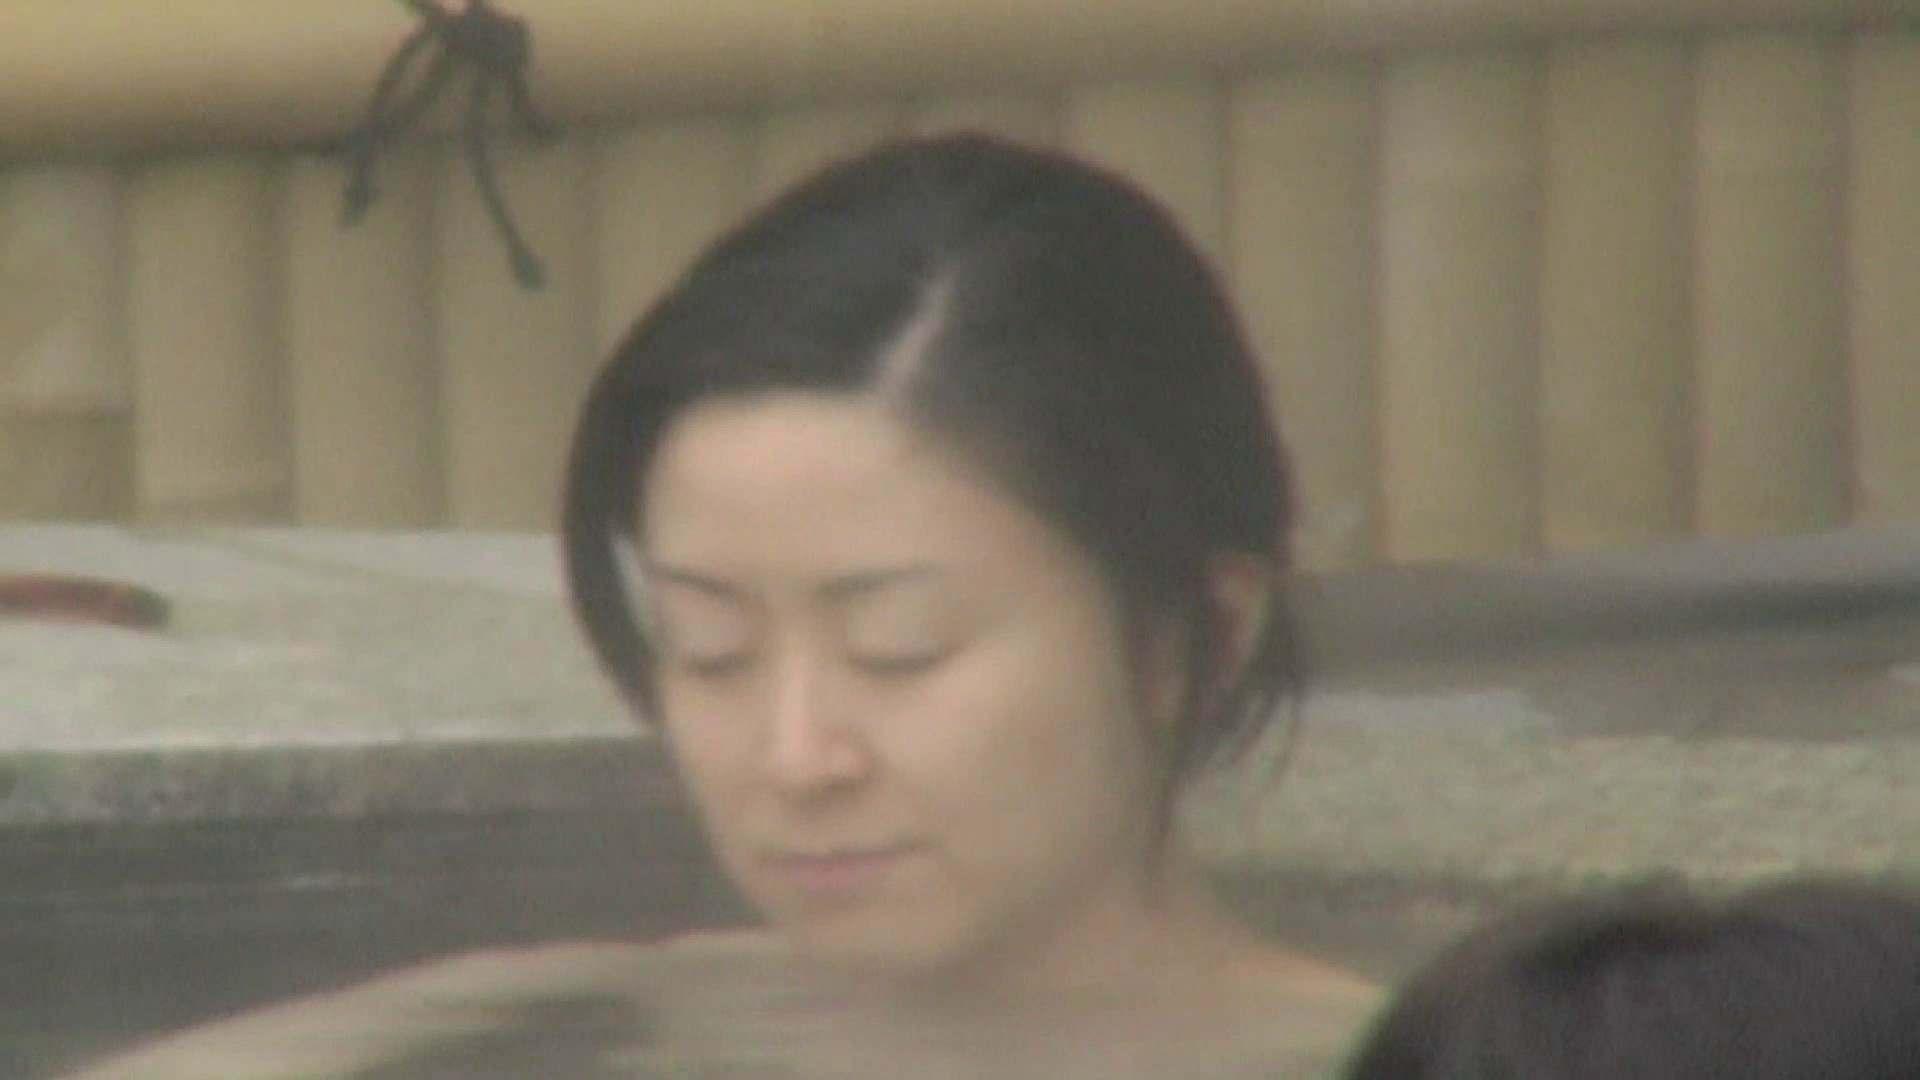 Aquaな露天風呂Vol.548 露天 覗きワレメ動画紹介 70連発 23